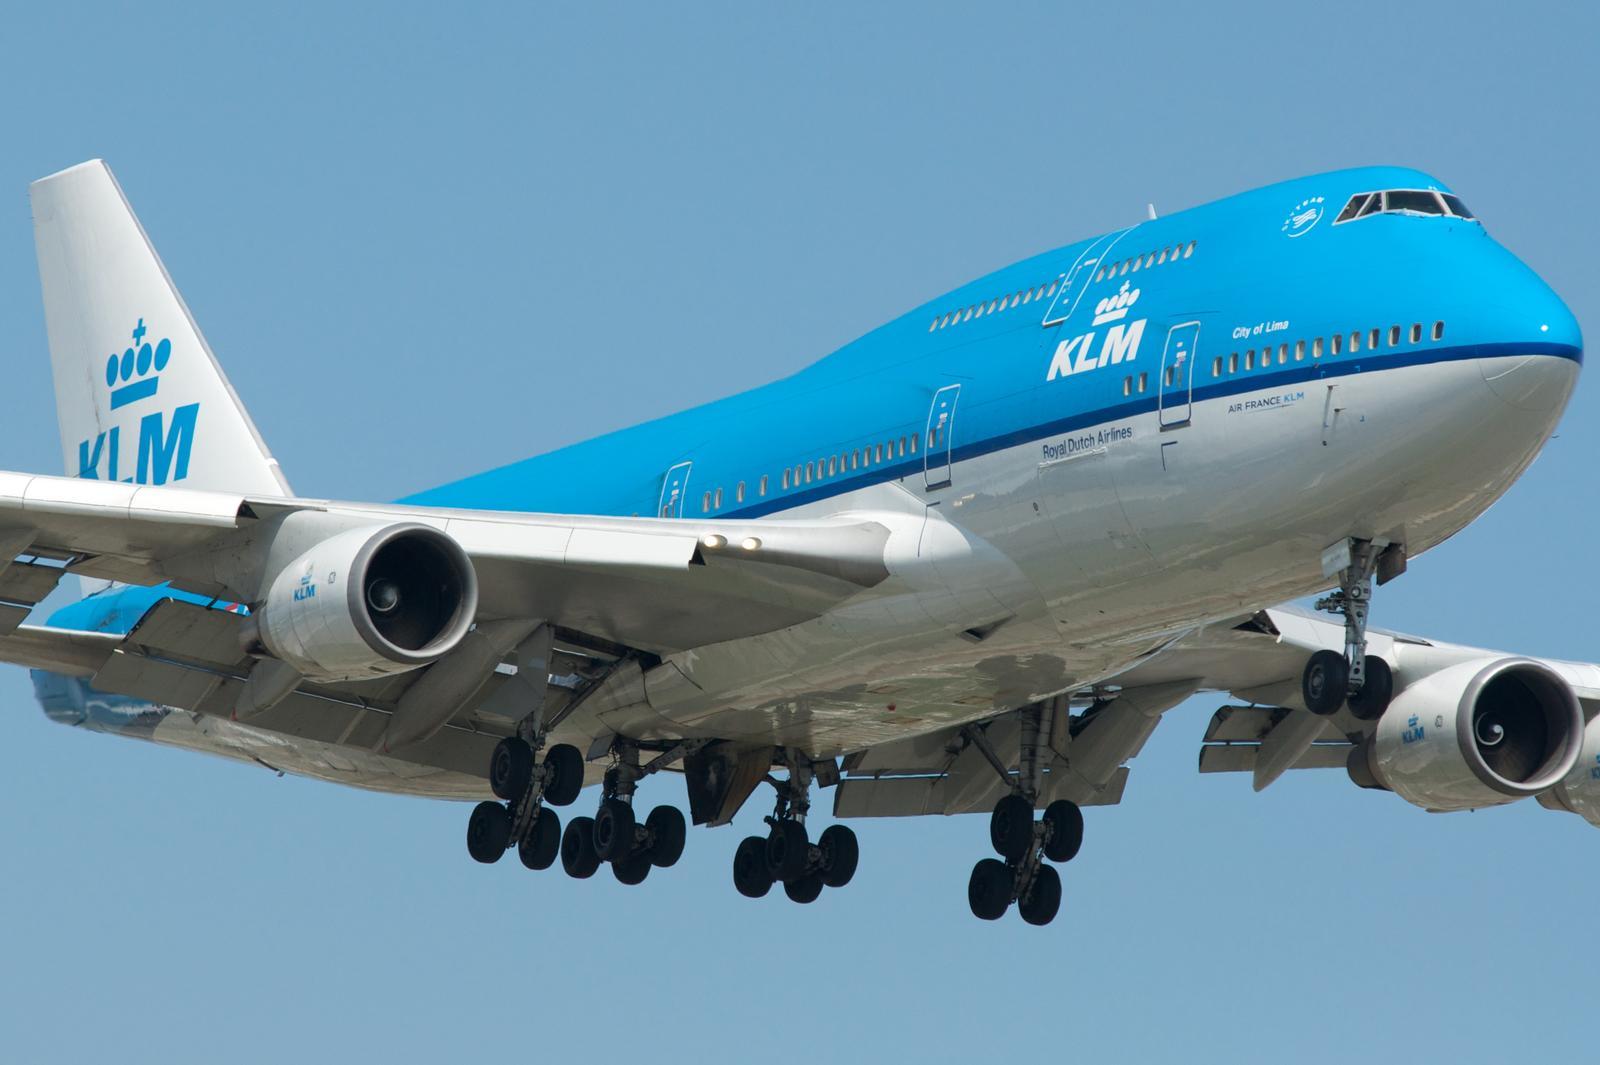 KLM Boeing 747-400